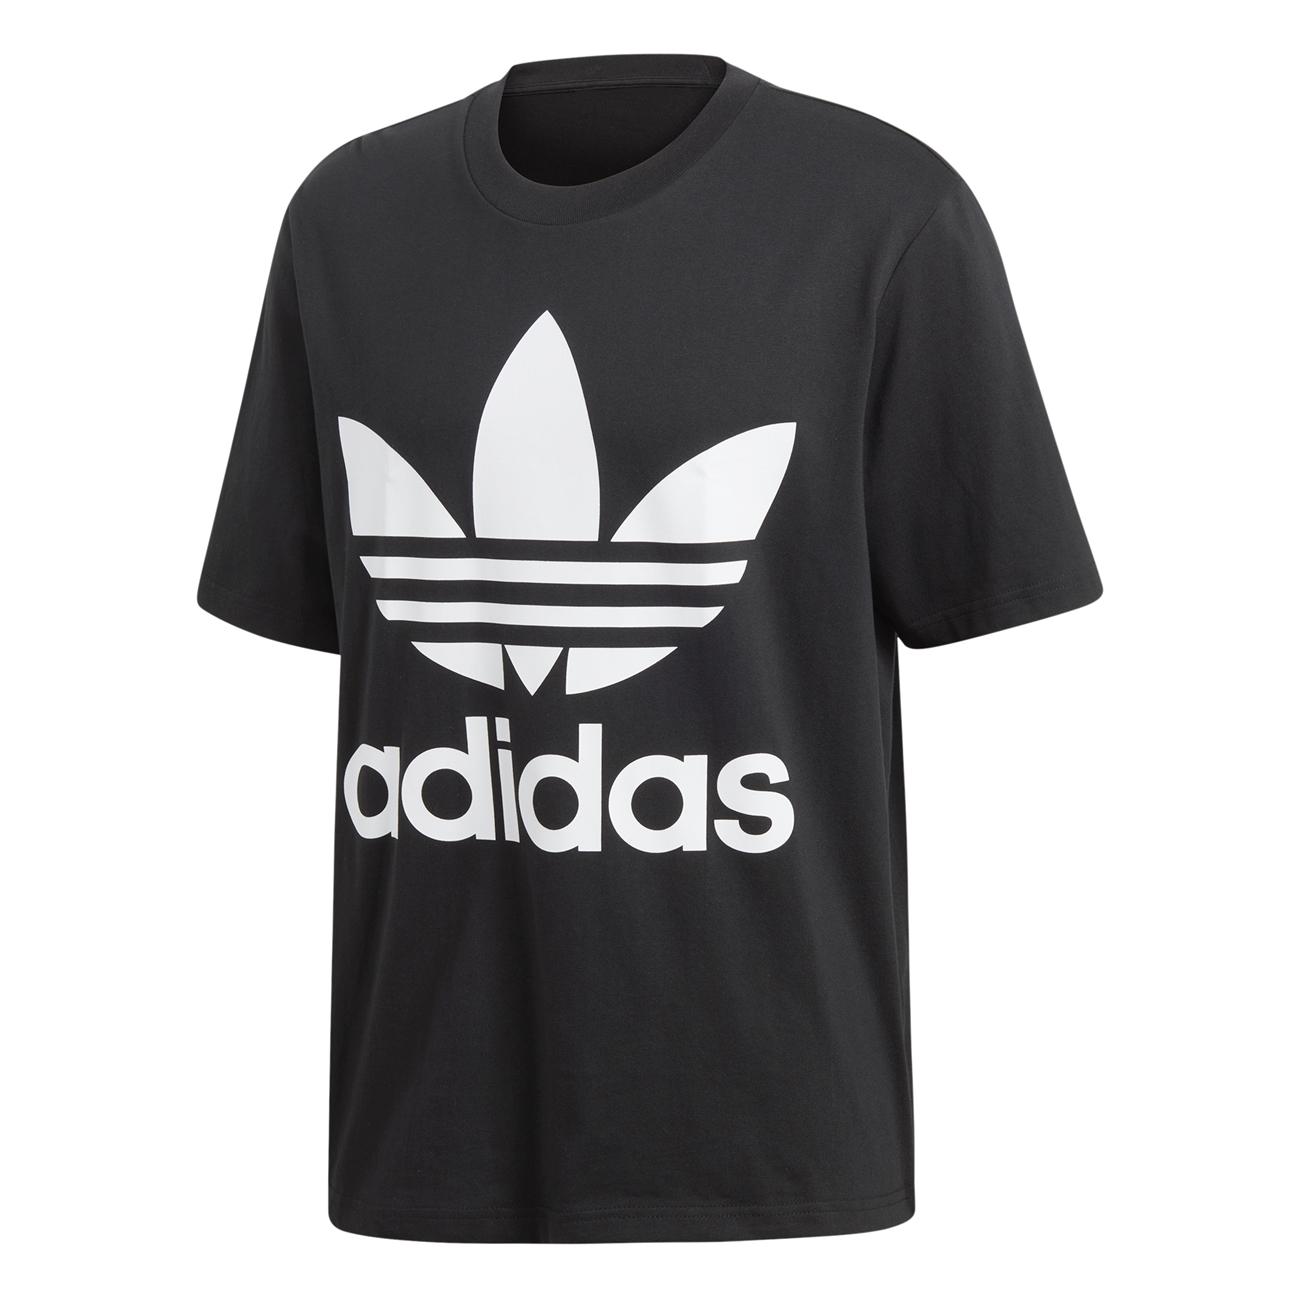 Camisetas de Deporte para Hombre - manelsanchez.com 5f09fa4a2d3